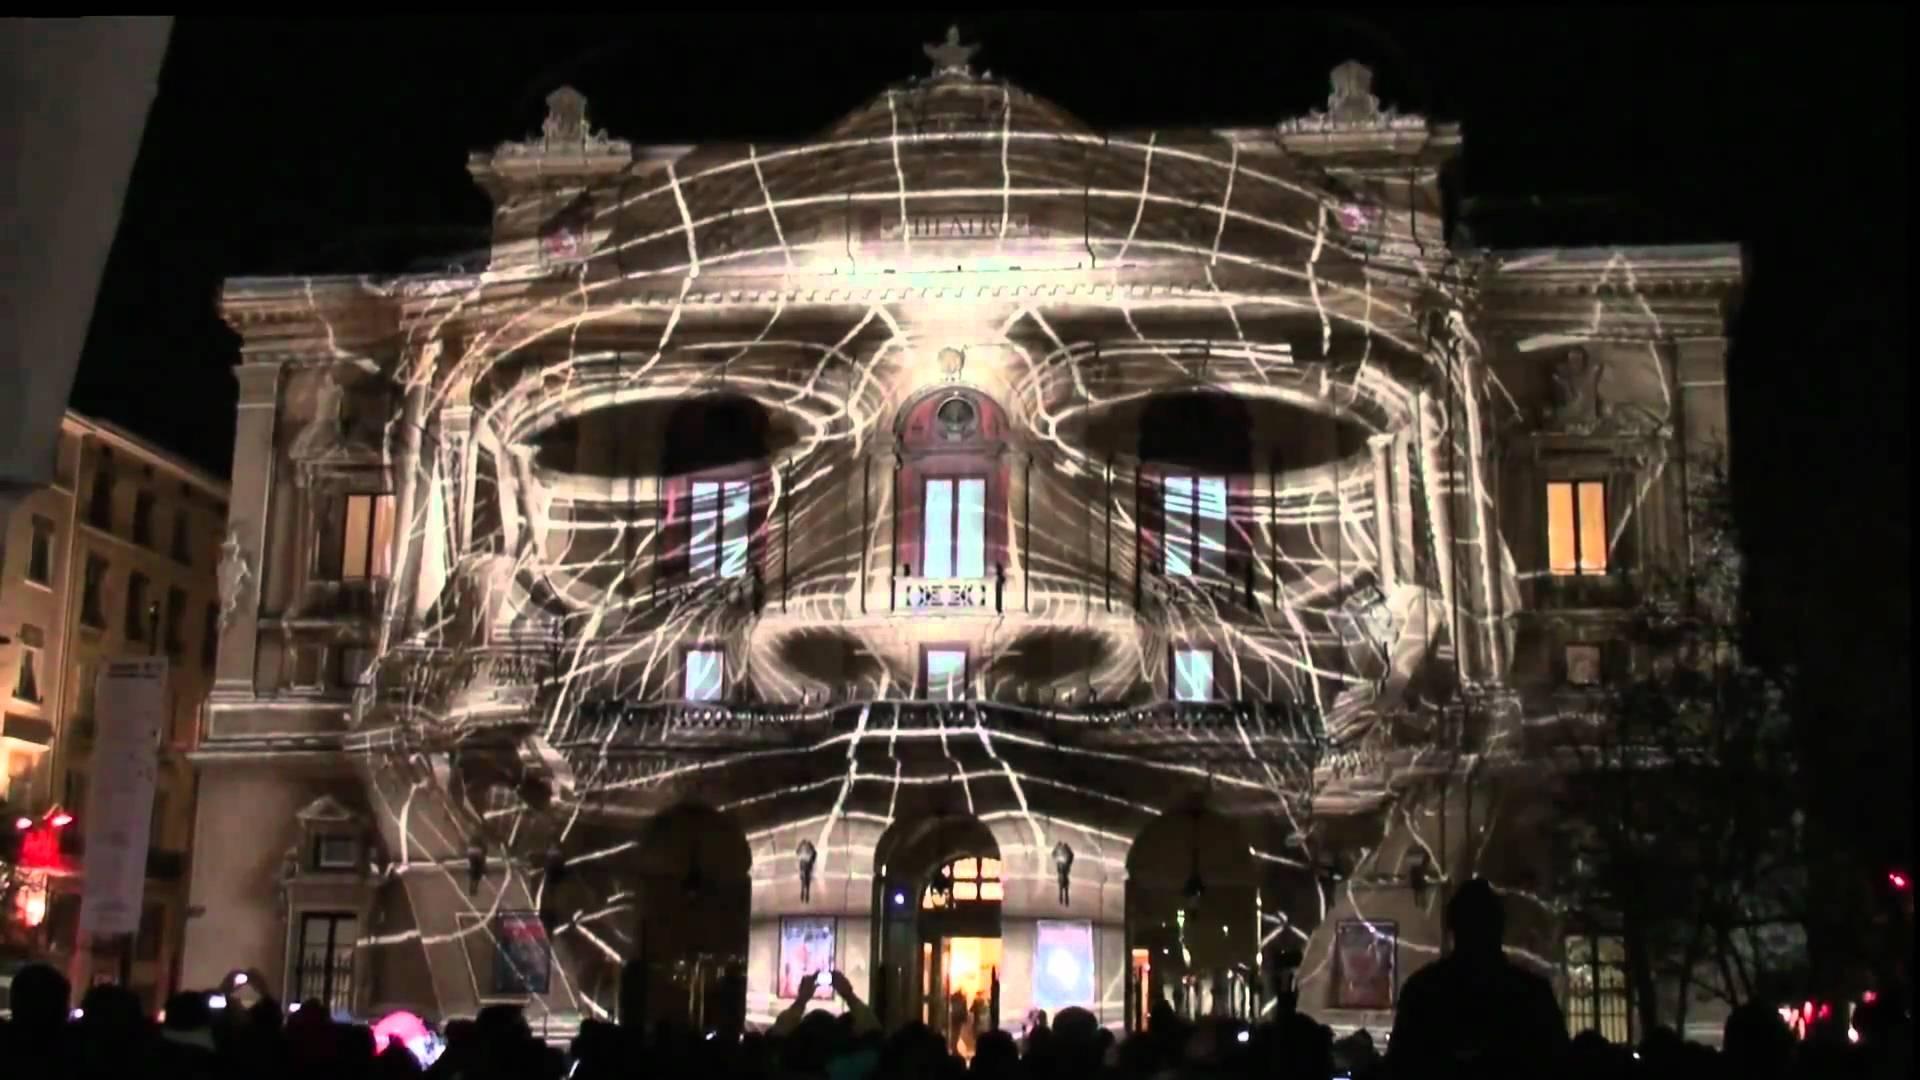 Lyon Festival Of Light - Scary Face